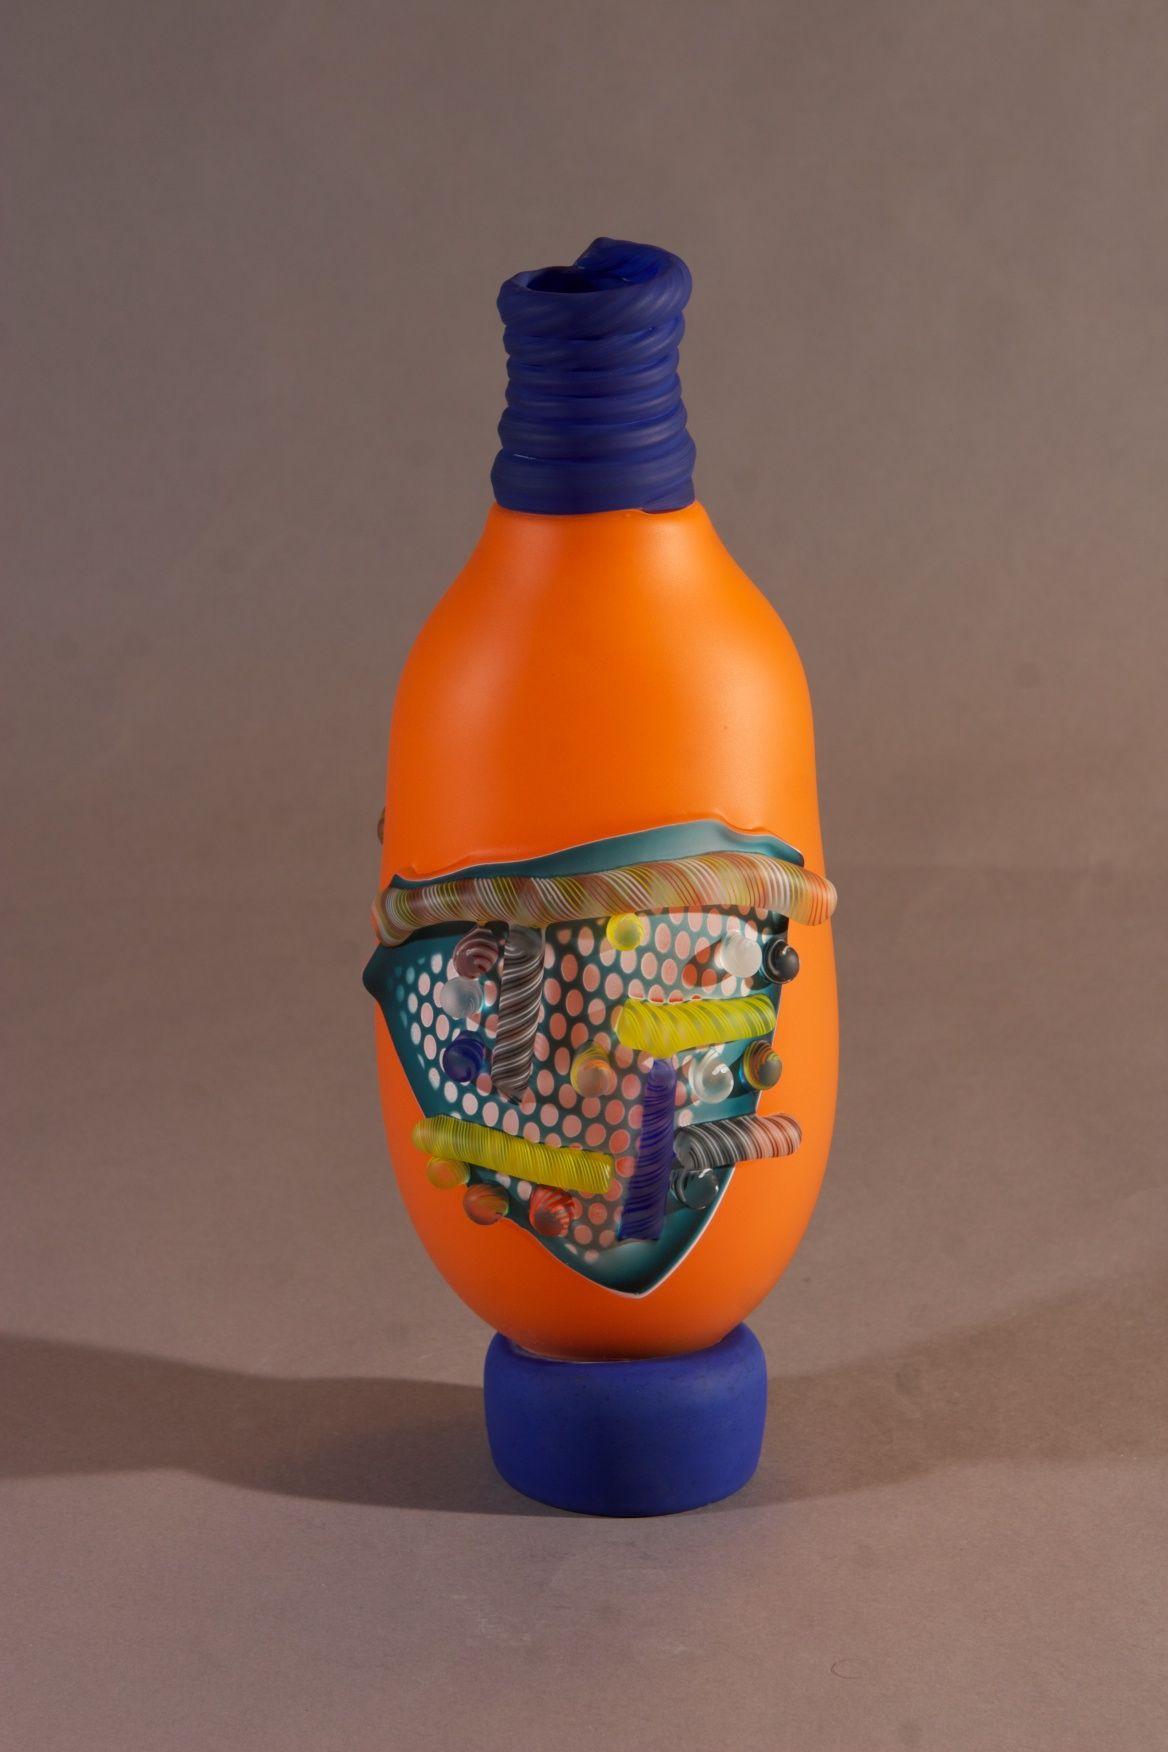 Shard Bottle Orange with Cobalt Blue Lip Wrap | James Wilbat Glass Studio